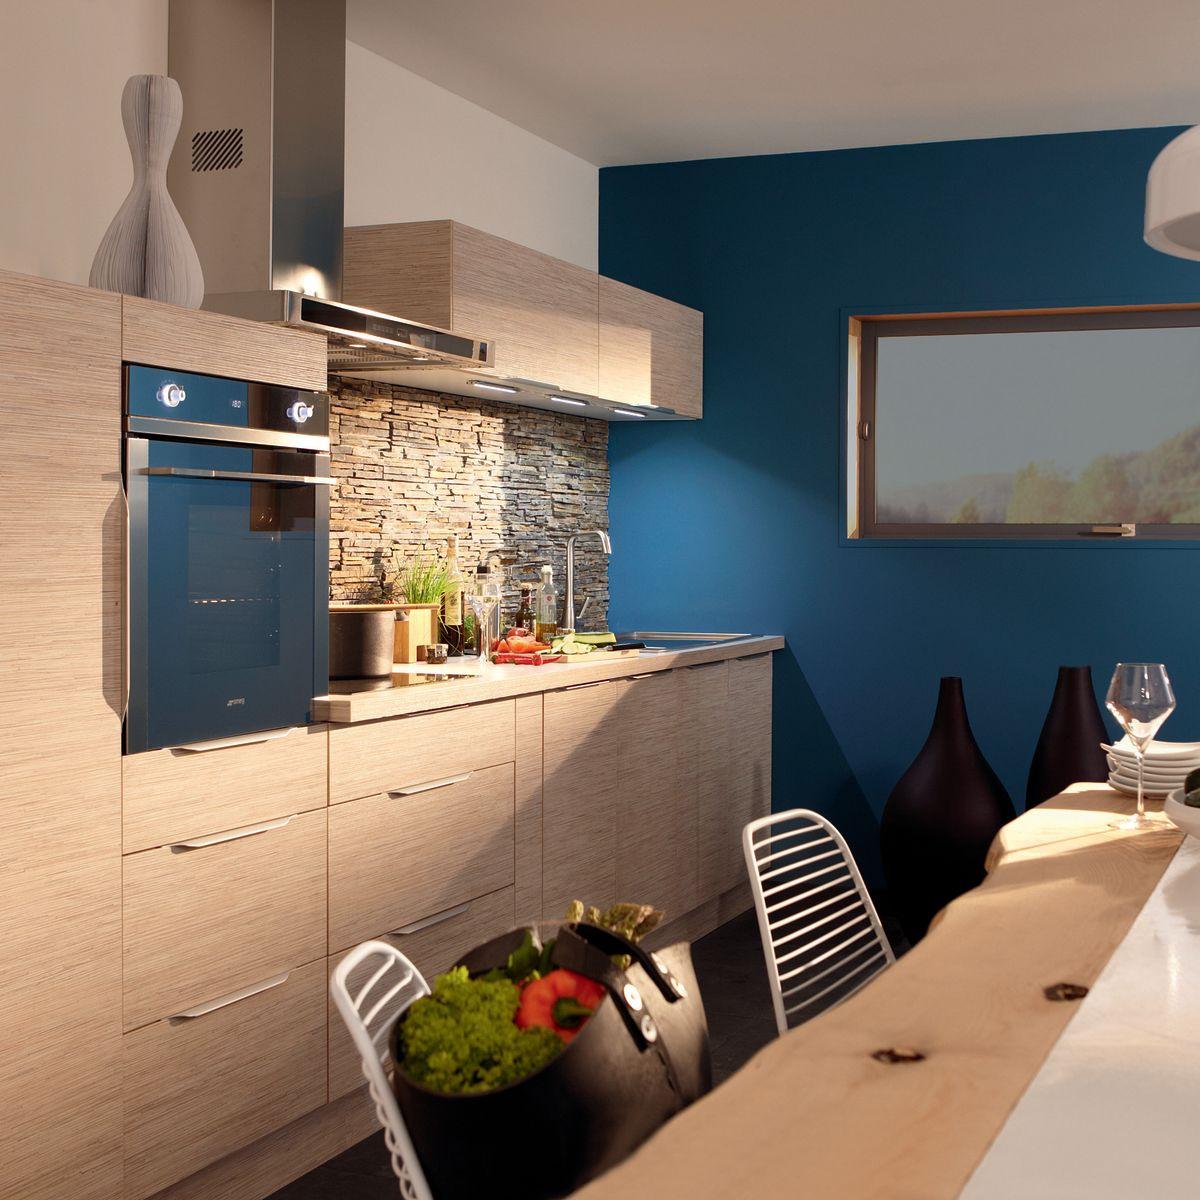 Cucina delinia vegetal prezzi e offerte online - Zoccolo cucina leroy merlin ...